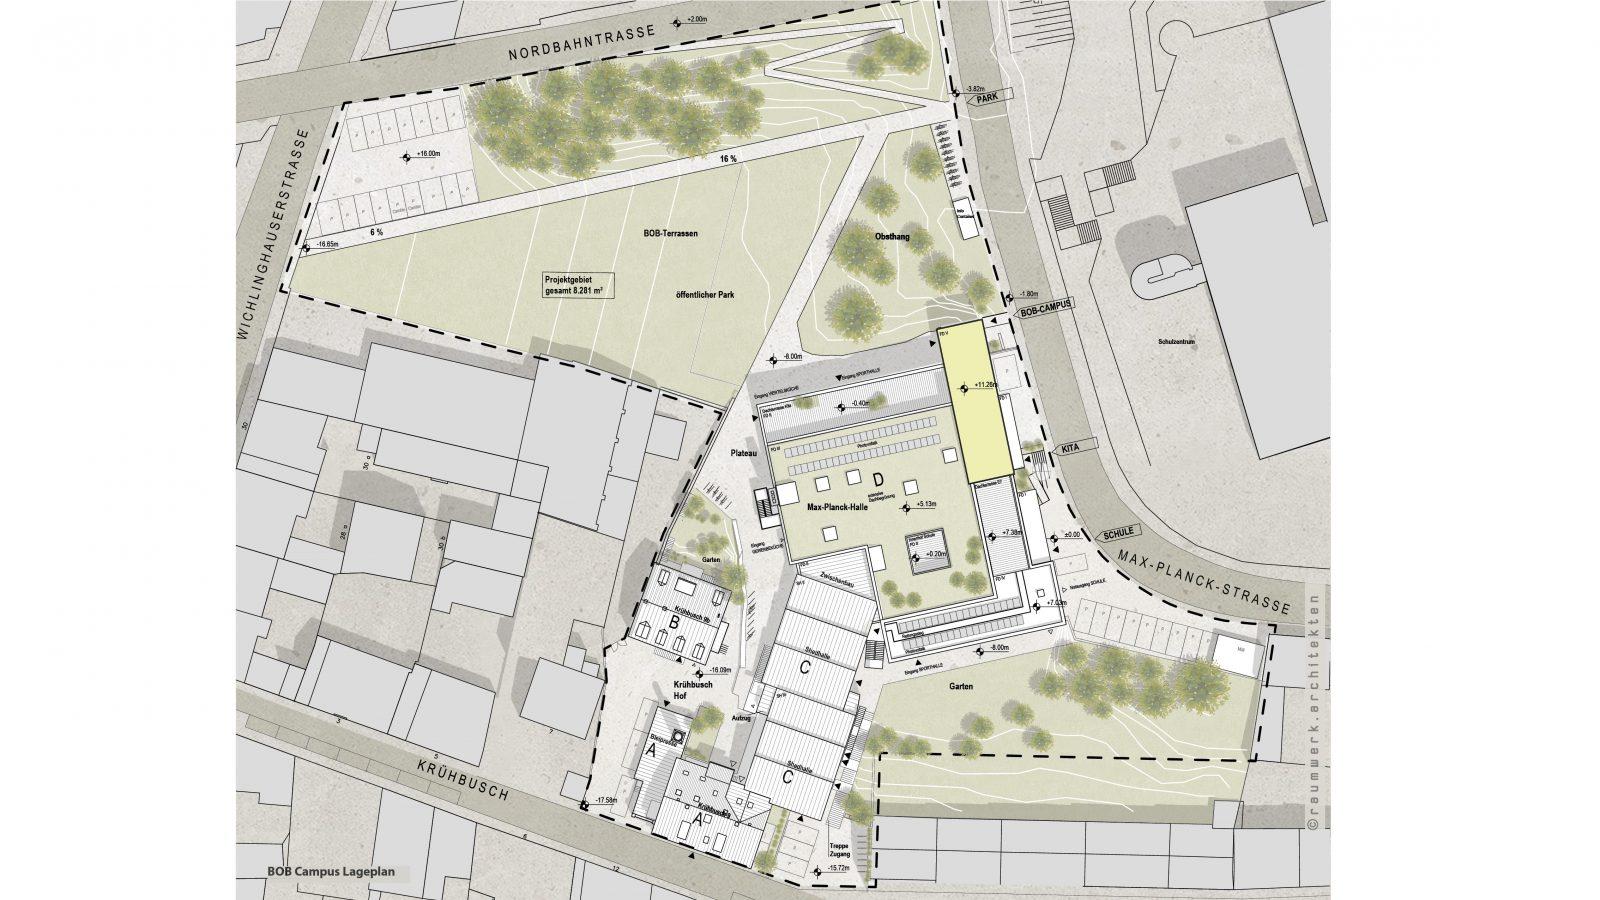 Lageplan: raumwerk.architekten, (C) Urbane Nachbarschaft BOB gGmbH